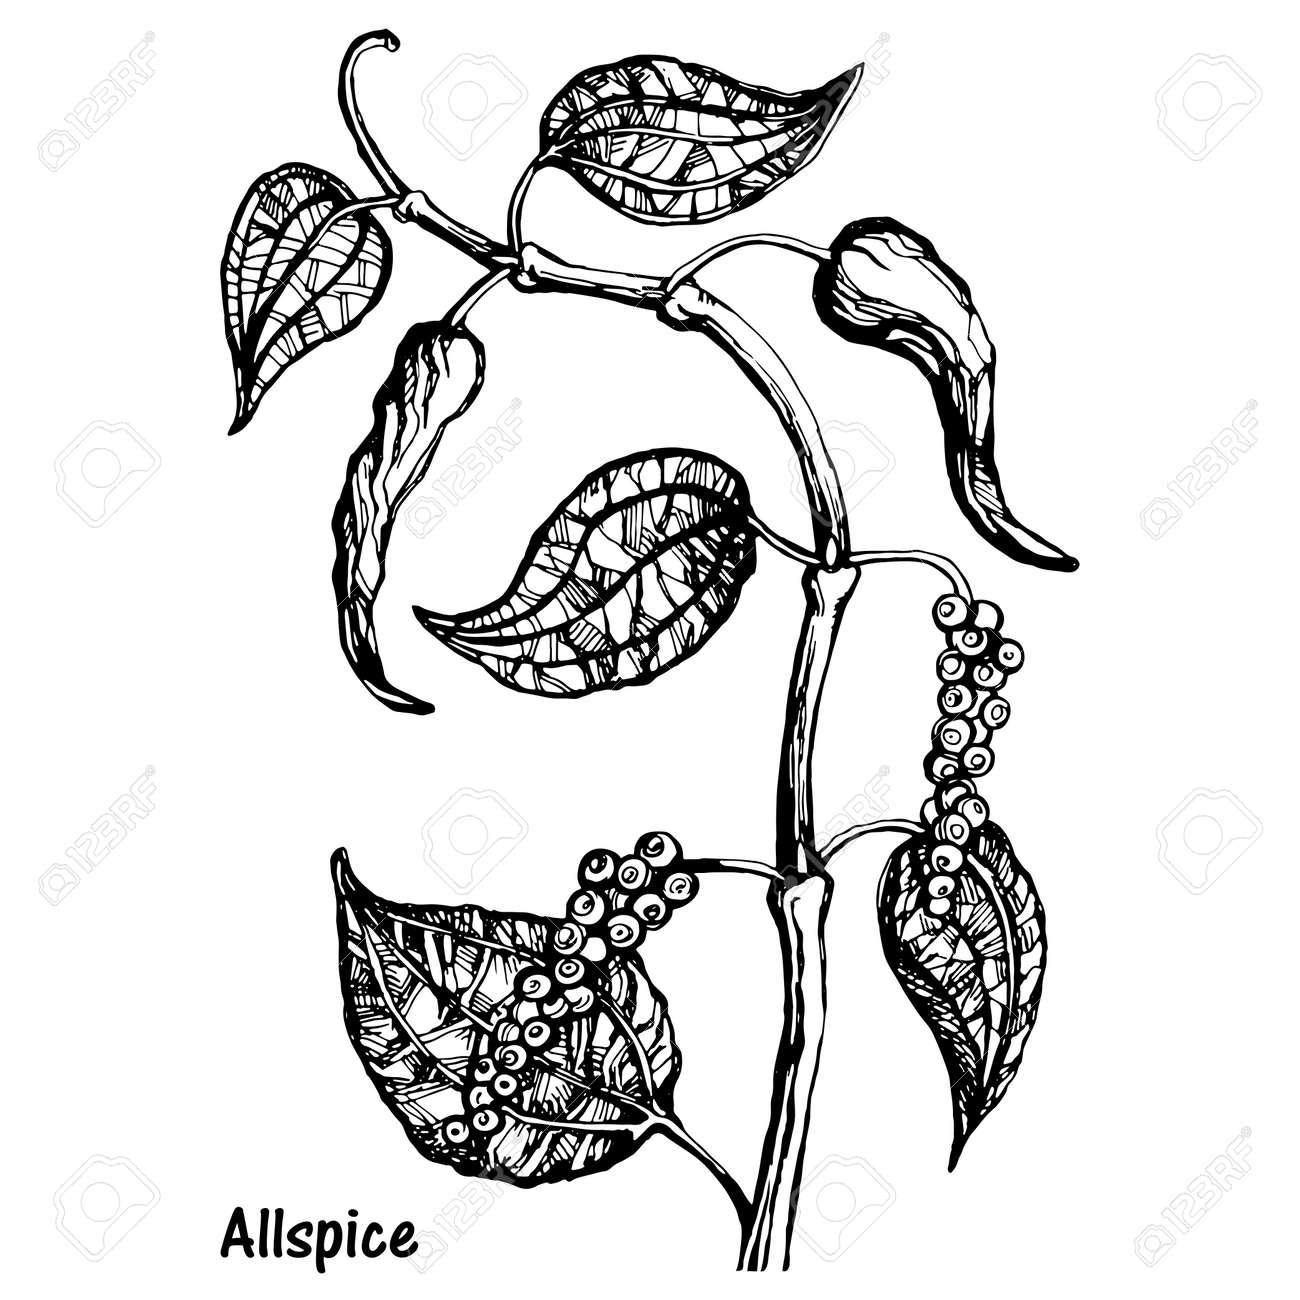 Natural allspice botanical hand drawn sketch vector - 132052869